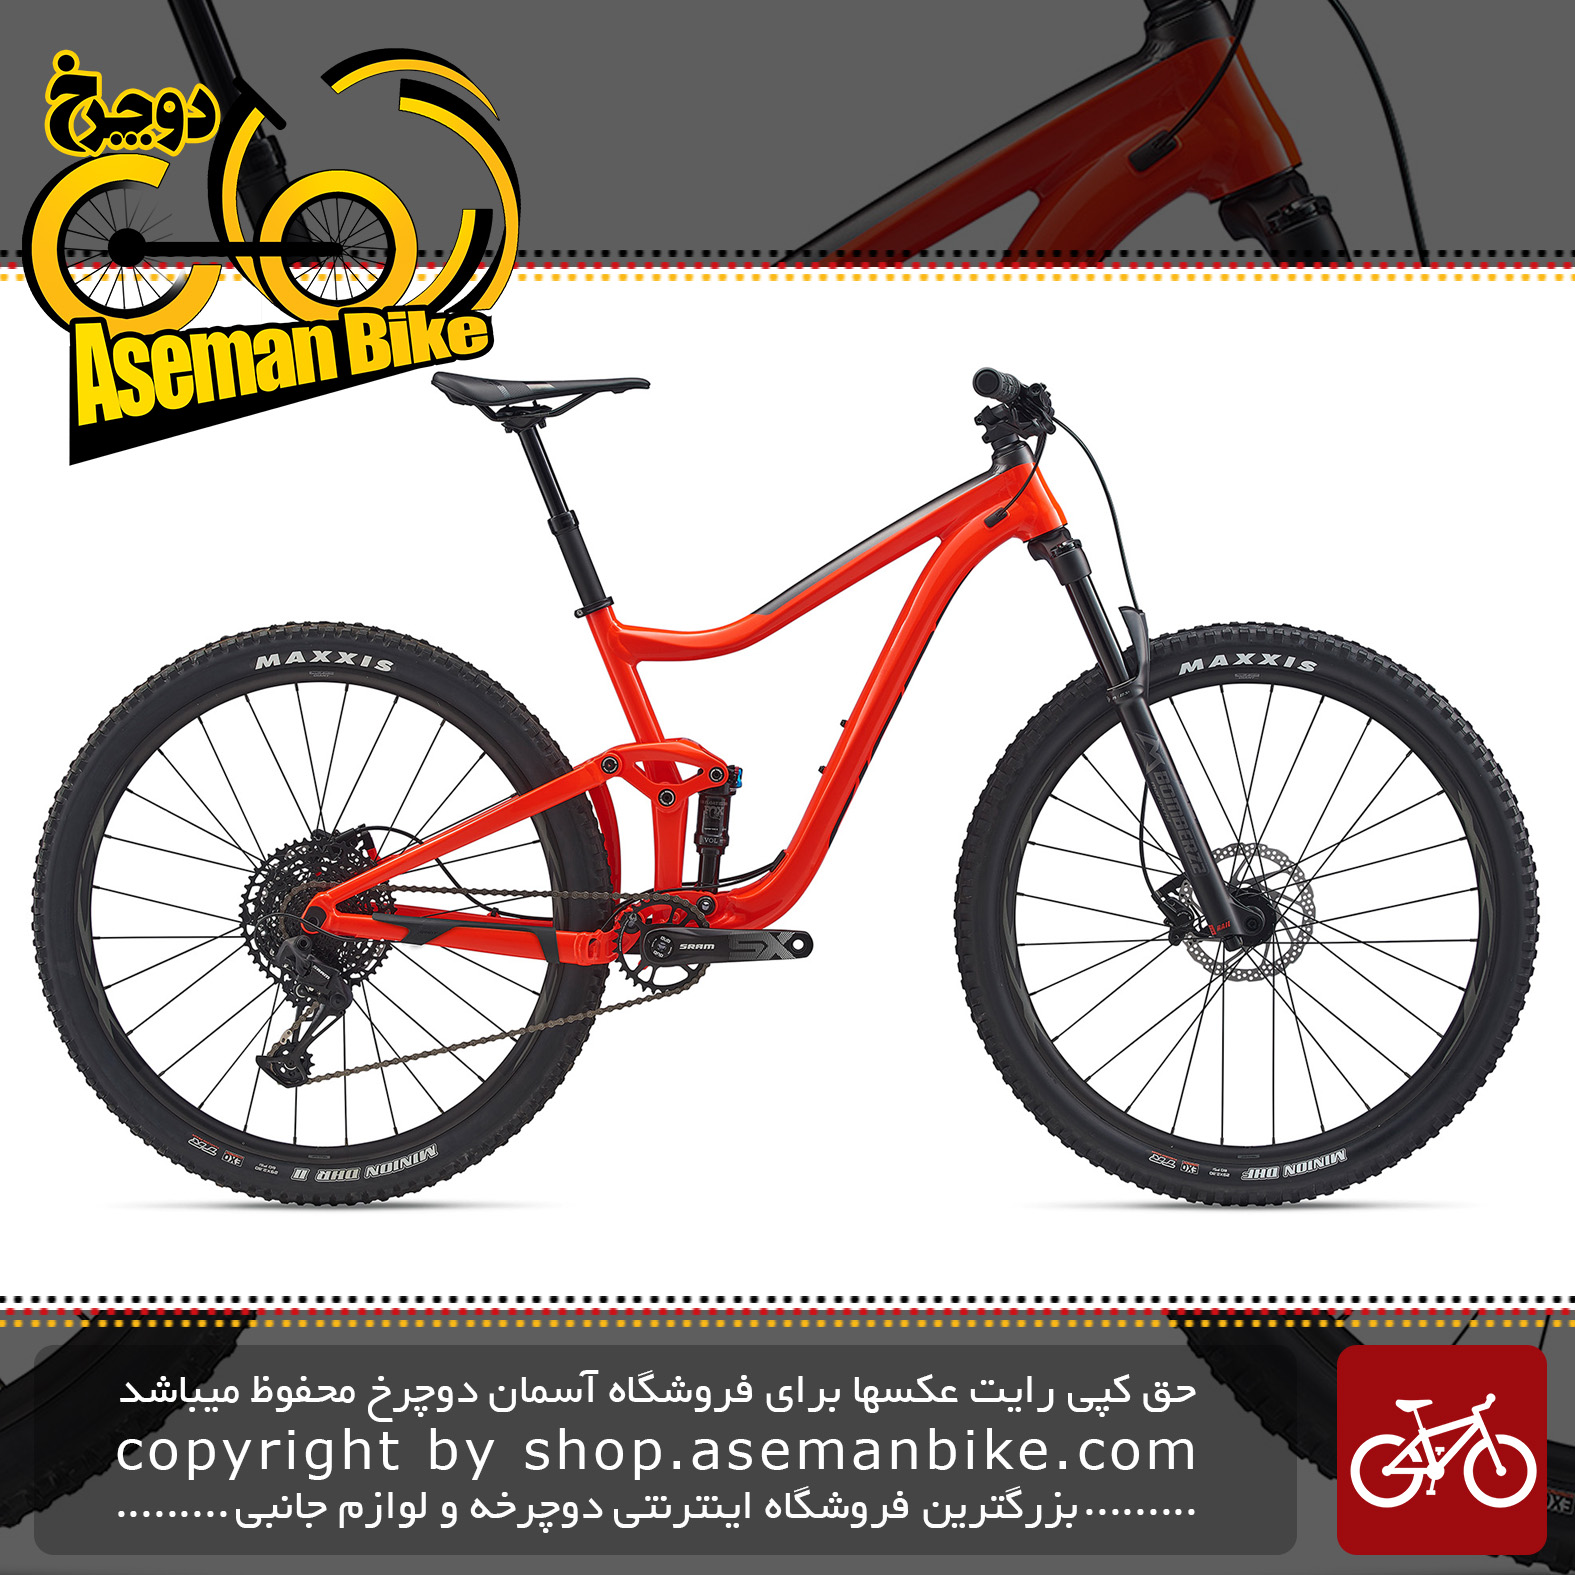 دوچرخه کوهستان جاینت مدل ترنس 29 3 2020 Giant Mountain Bicycle Trance 29 3 2020دوچرخه کوهستان جاینت مدل ترنس 29 3 2020 Giant Mountain Bicycle Trance 29 3 2020